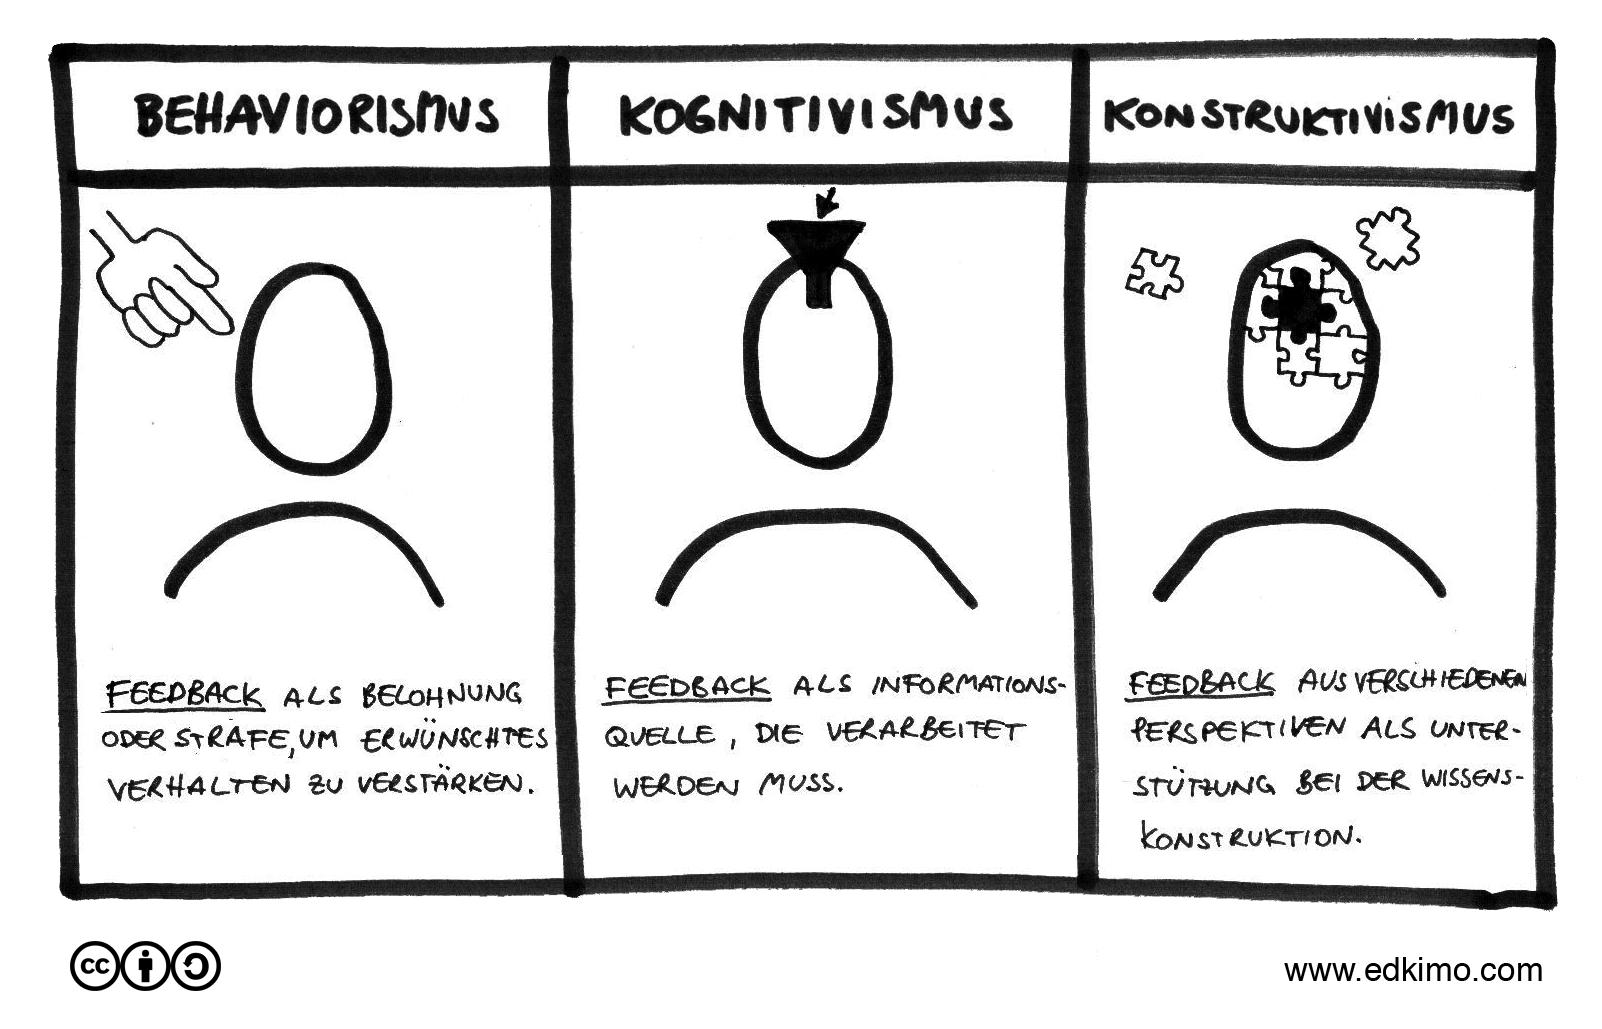 Schülerfeedback-Behaviorismus-Kognitivismus-Konstruktivismus_Feedback-Edkimo